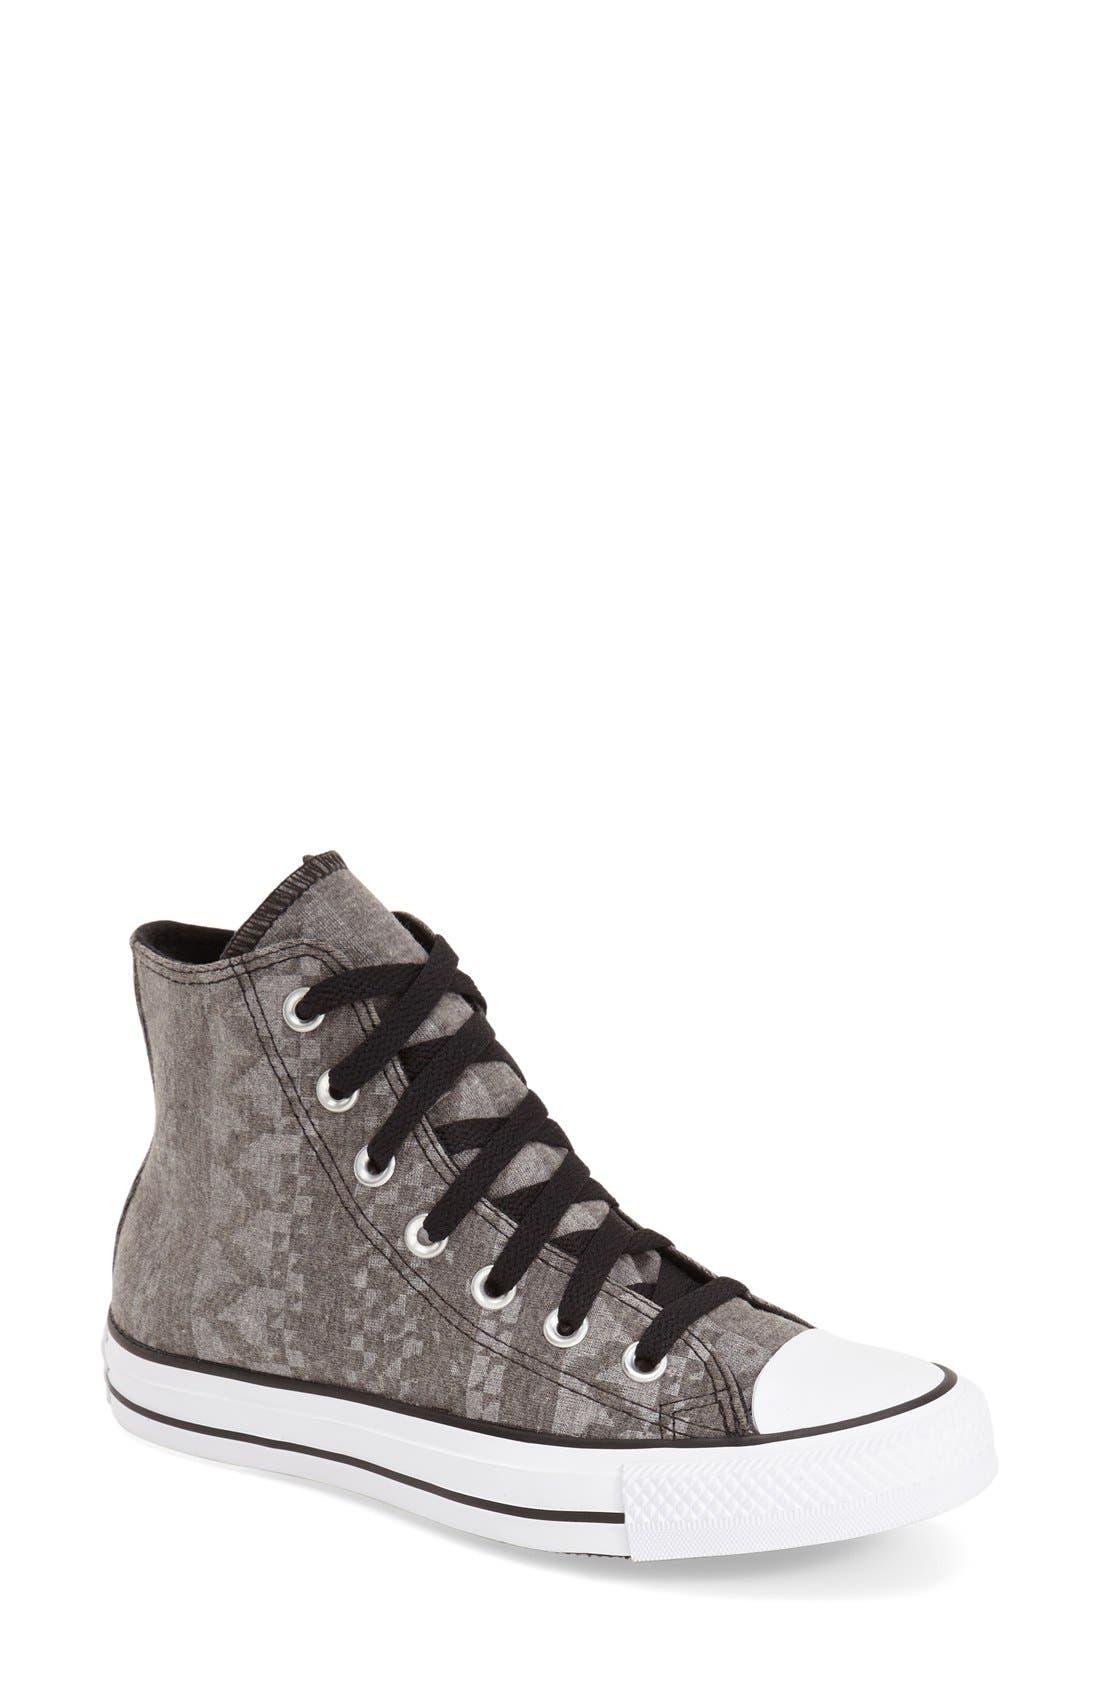 Main Image - Converse Chuck Taylor® All Star® Geo Print High Top Sneaker (Women)